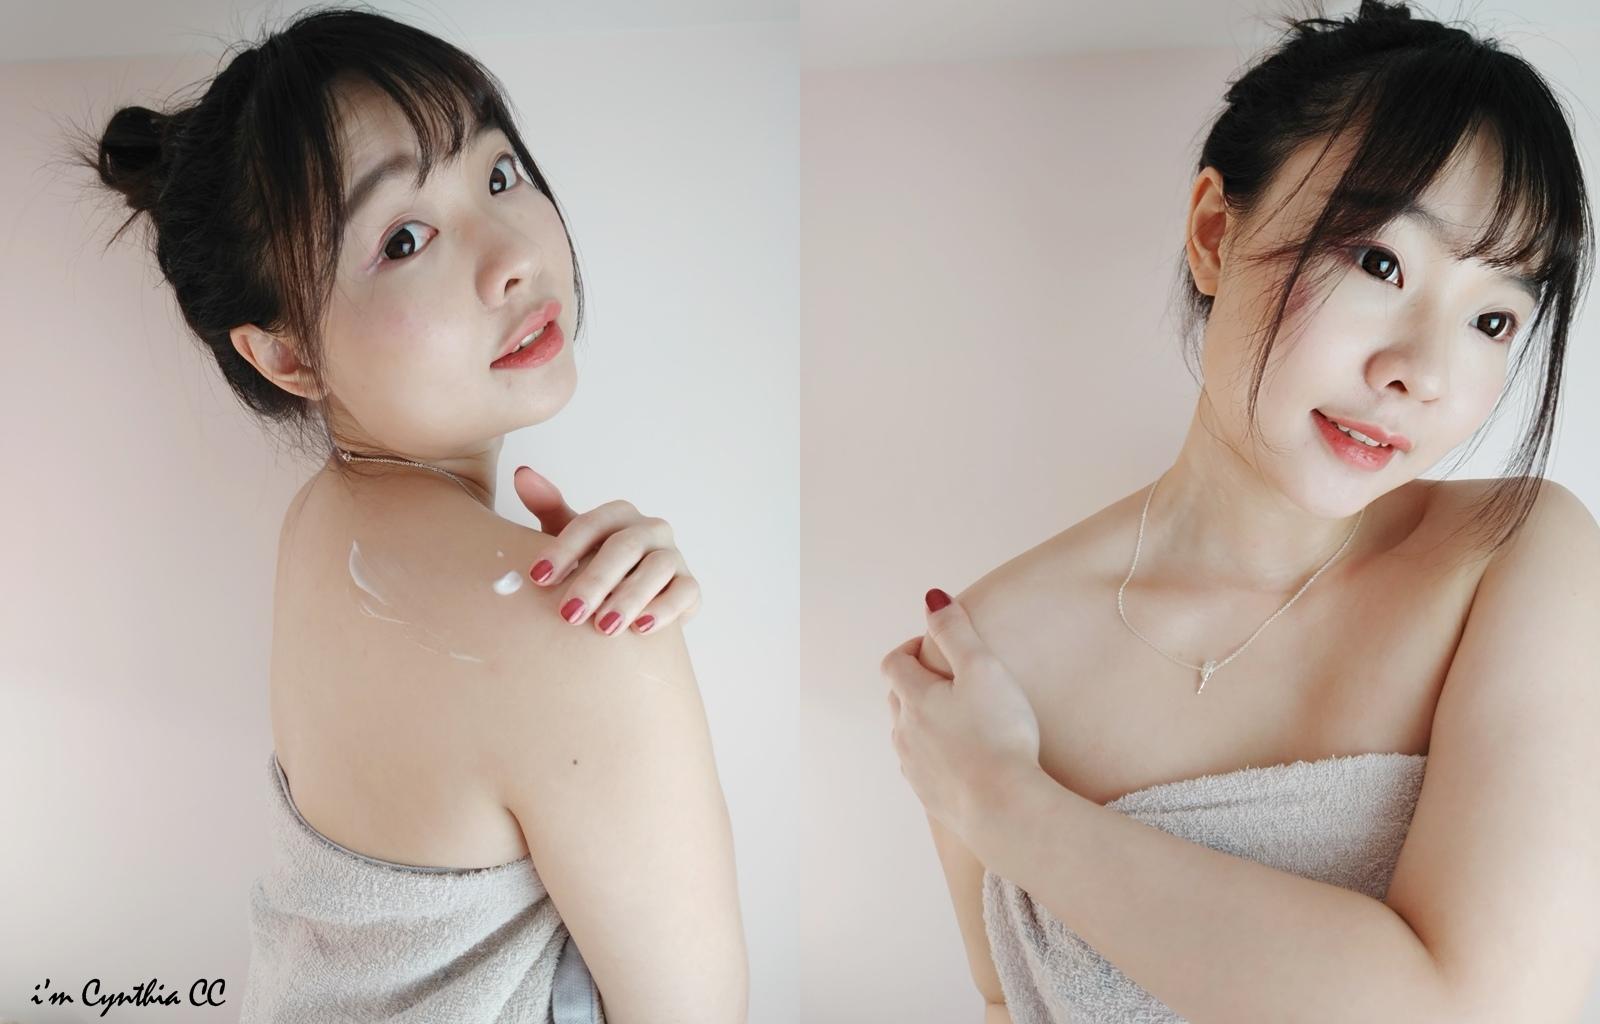 KS beauty Body Lotion凱欣絲妮魅力香氛身體乳液